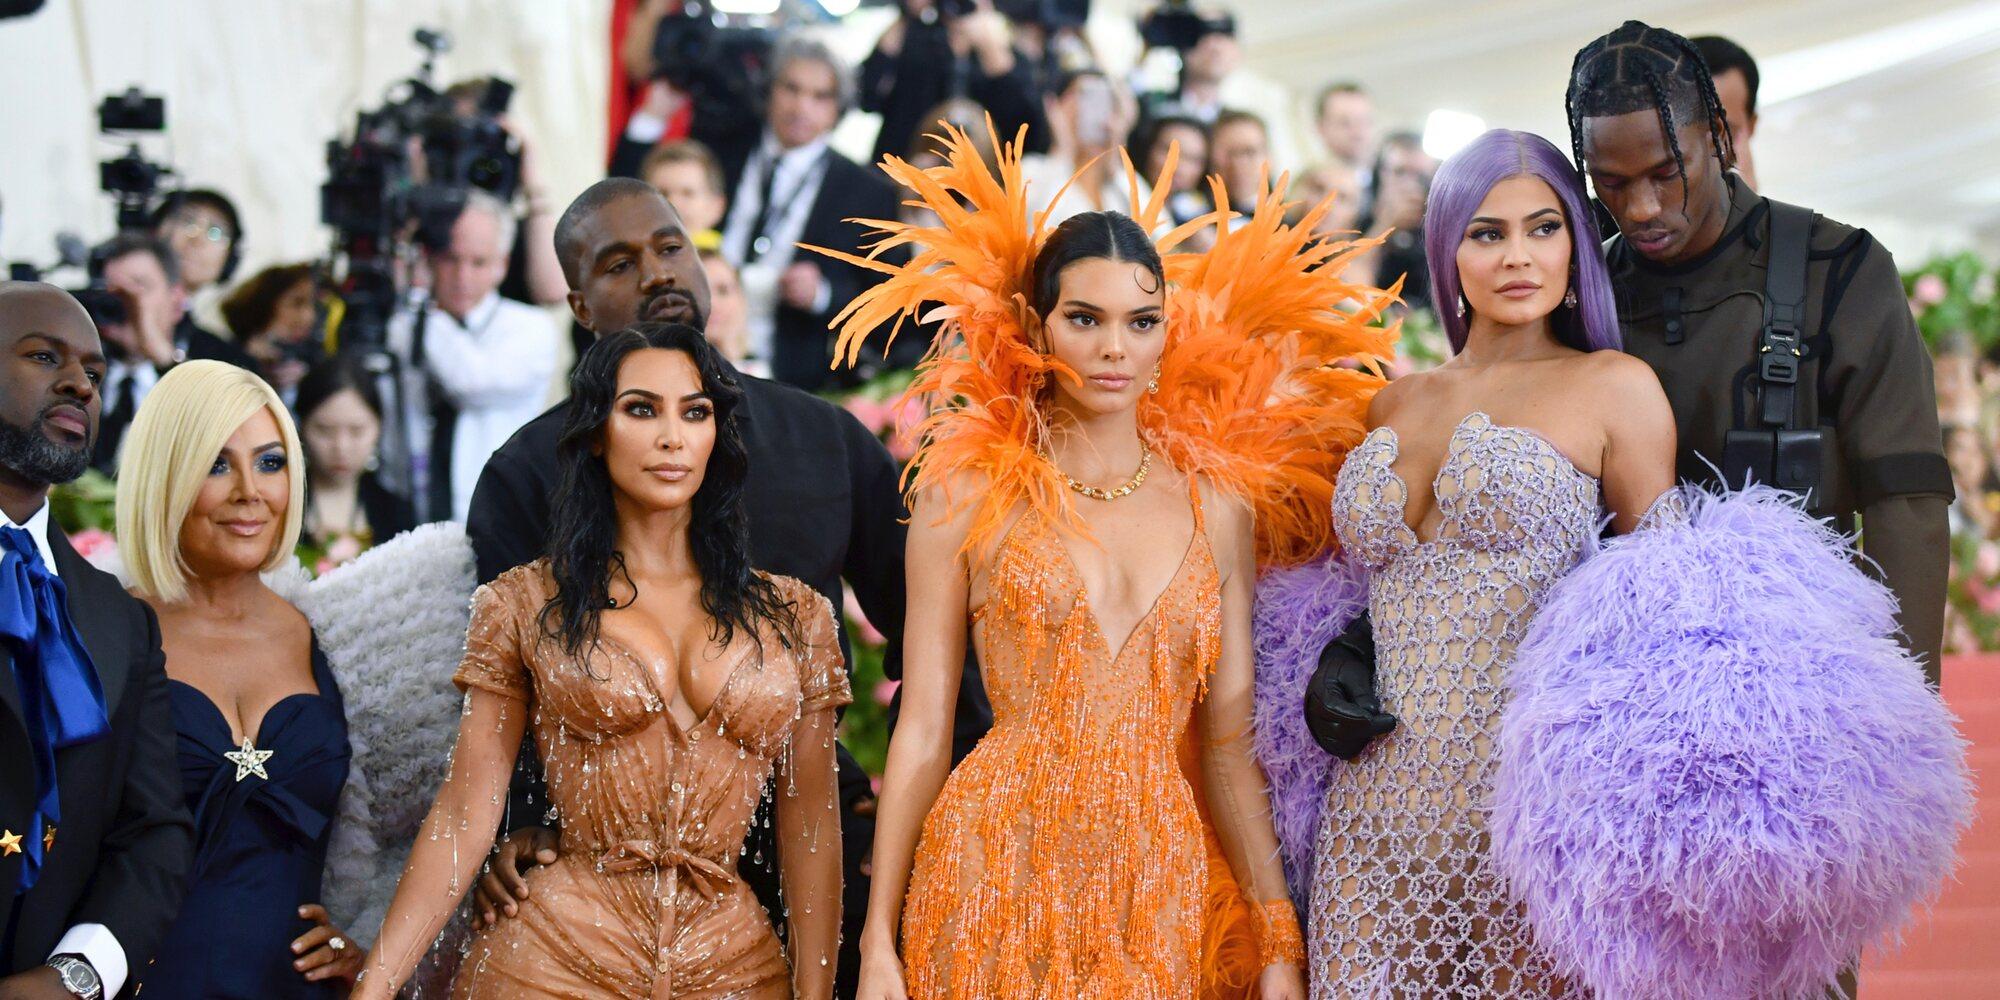 Kanye West deja de seguir a todas las Kardashian-Jenner tras el fin de 'Keeping Up With The Kardashians'